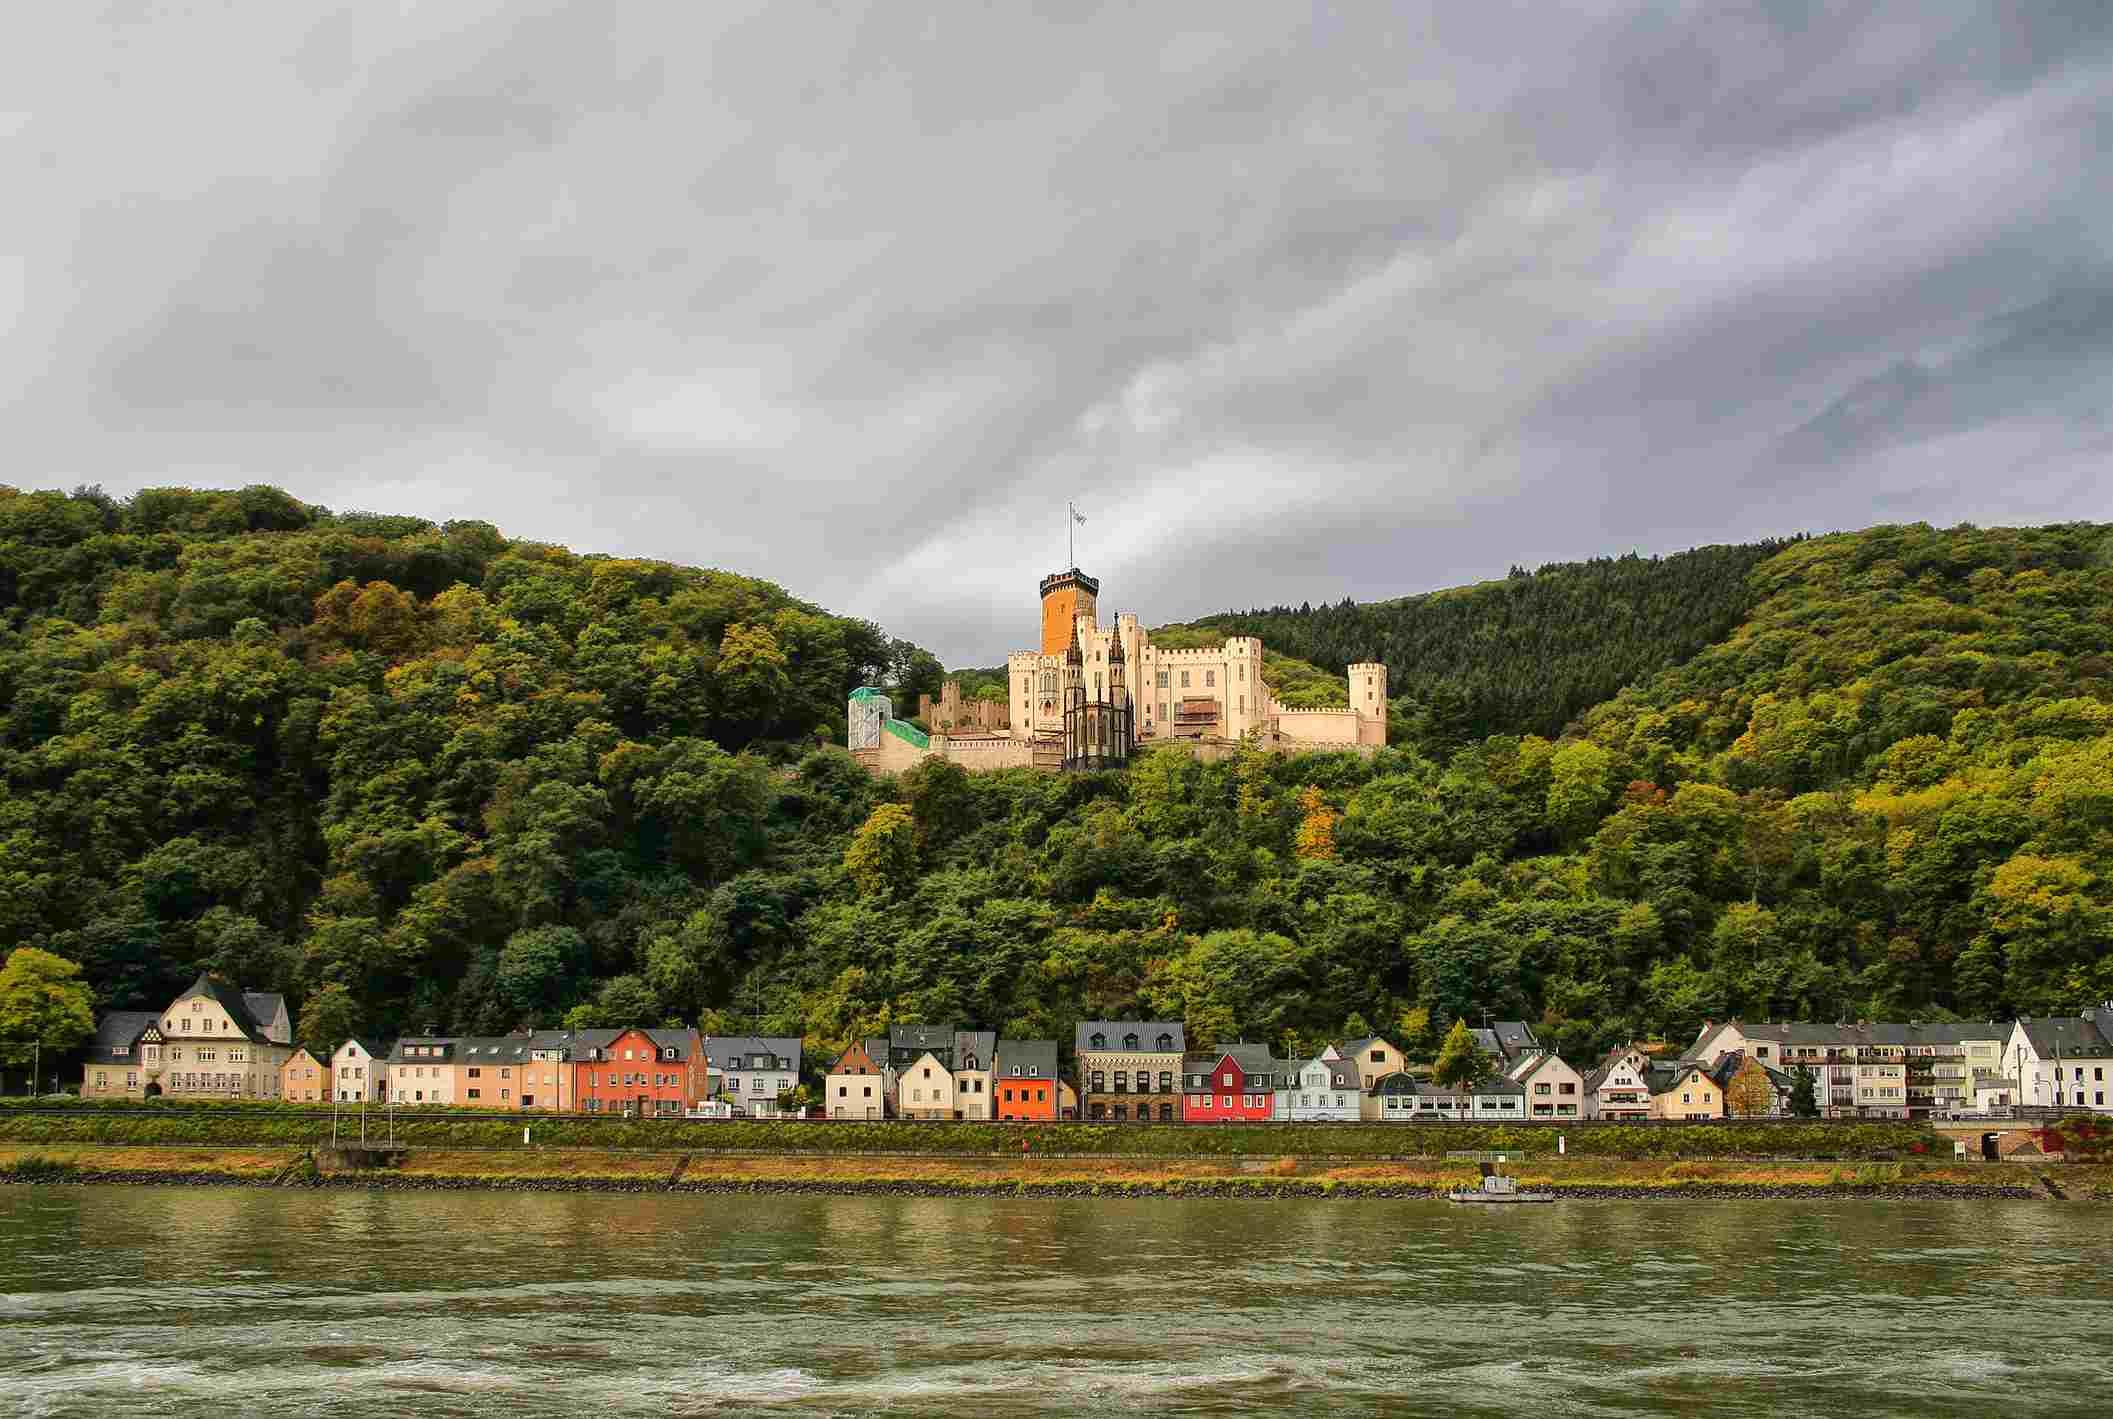 Koblenz's Stolzenfels Castle